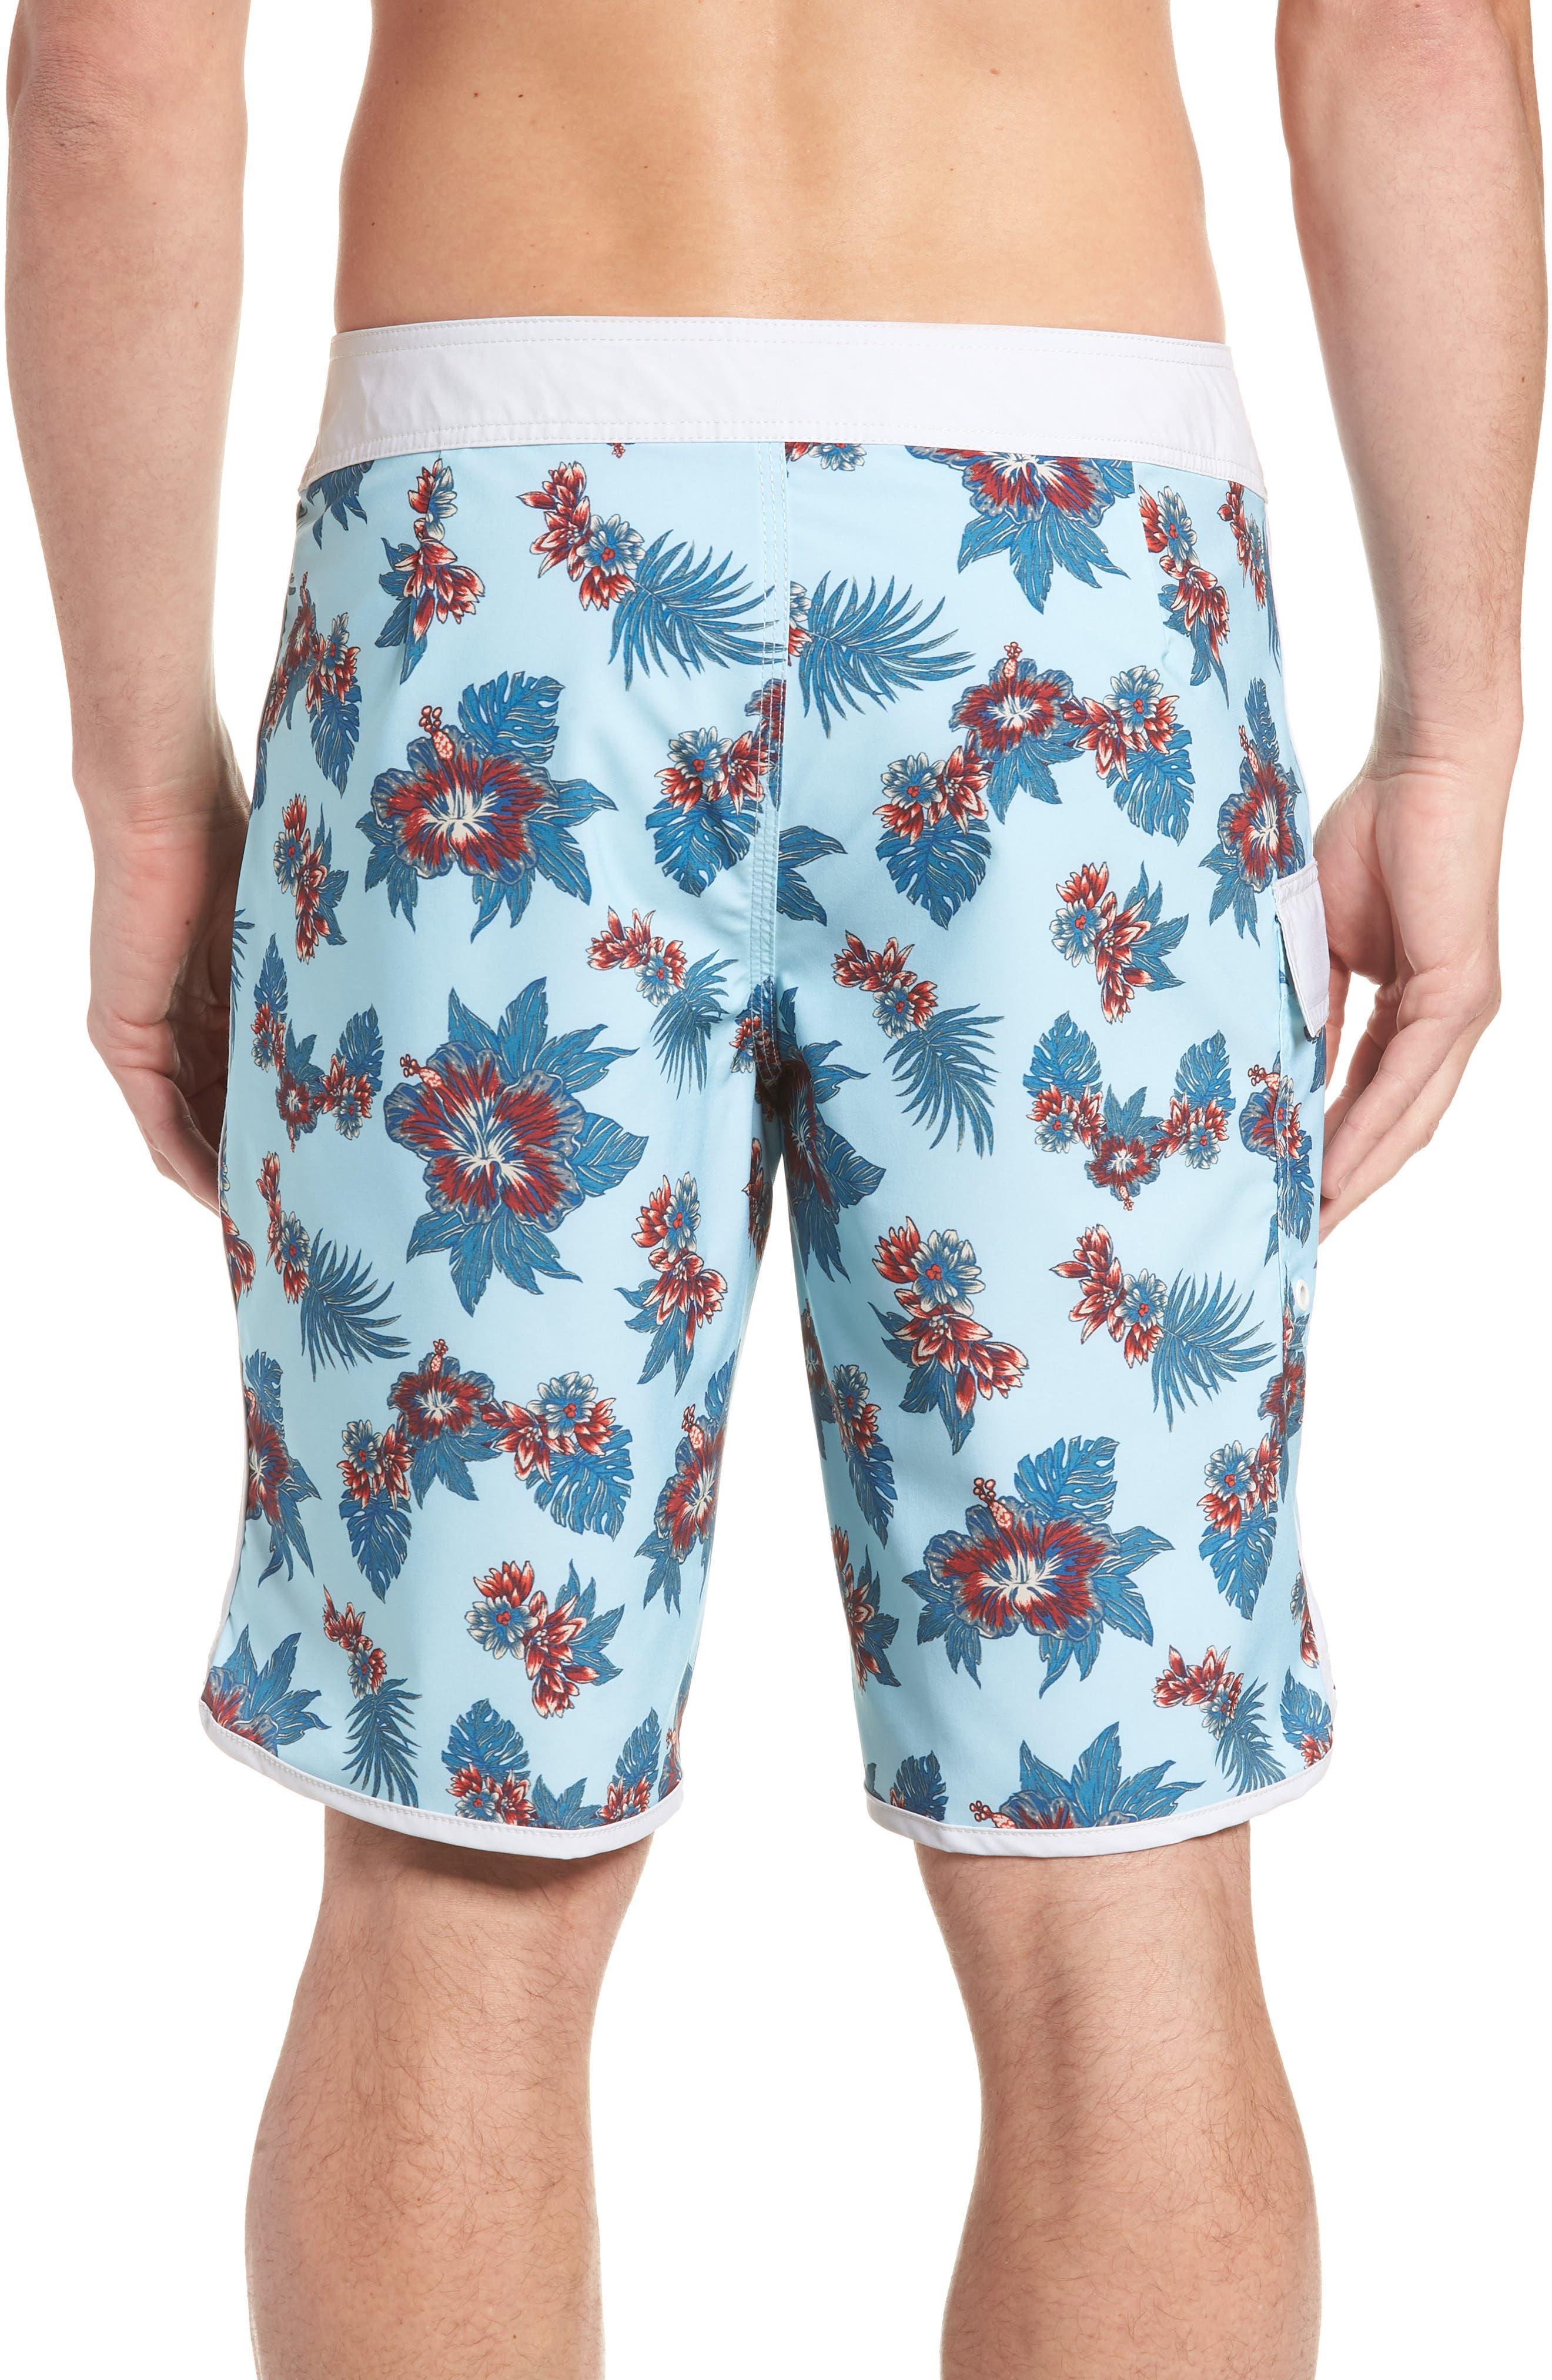 Jeff McMillan Floral Swim Trunks,                             Alternate thumbnail 2, color,                             Blue Floral